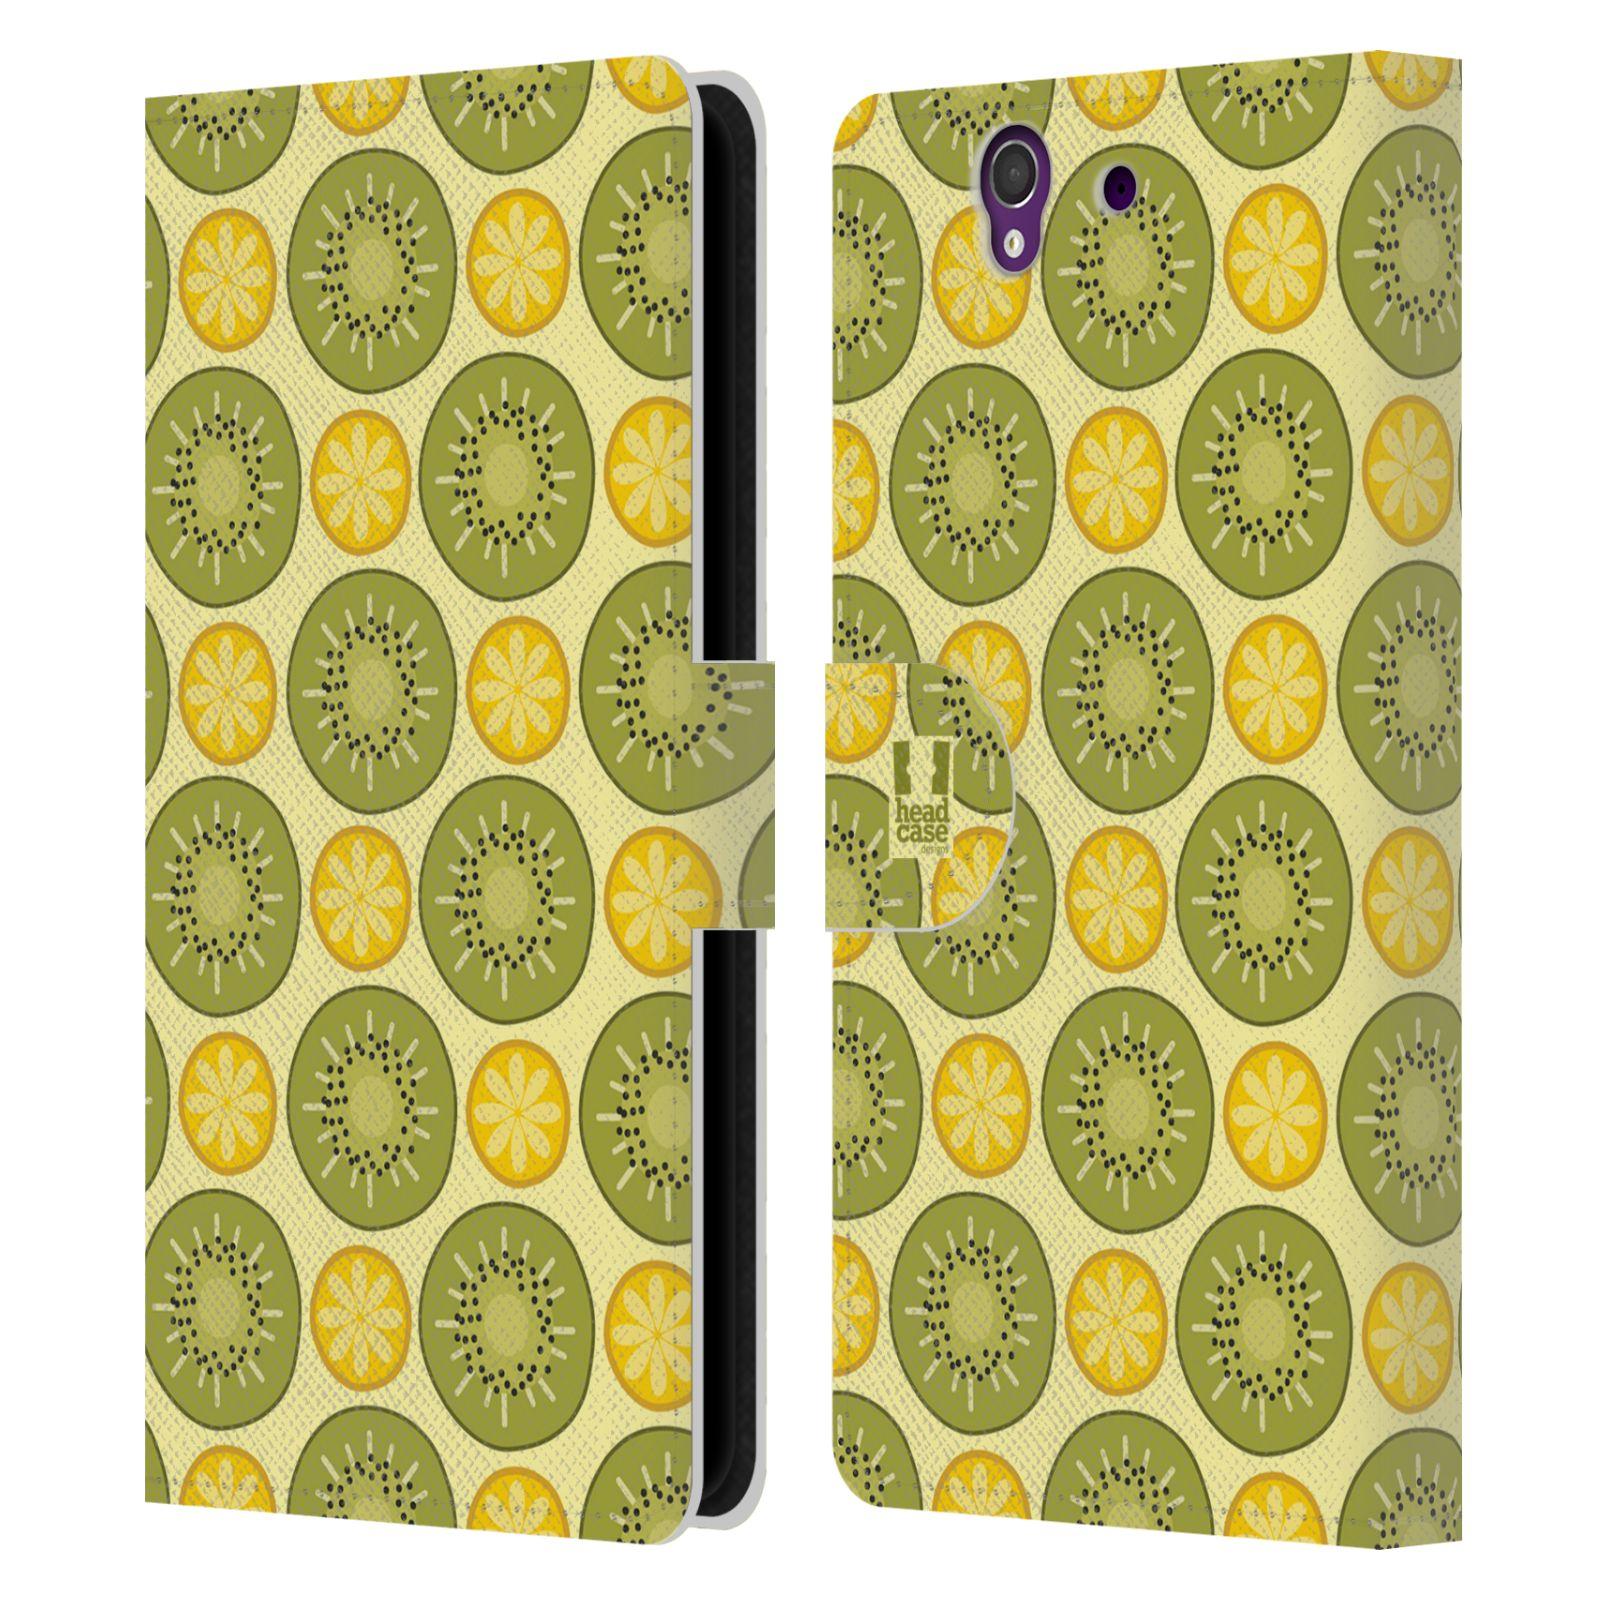 HEAD CASE Flipové pouzdro pro mobil SONY XPERIA Z (C6603) ovocné motivy citrus a kiwi